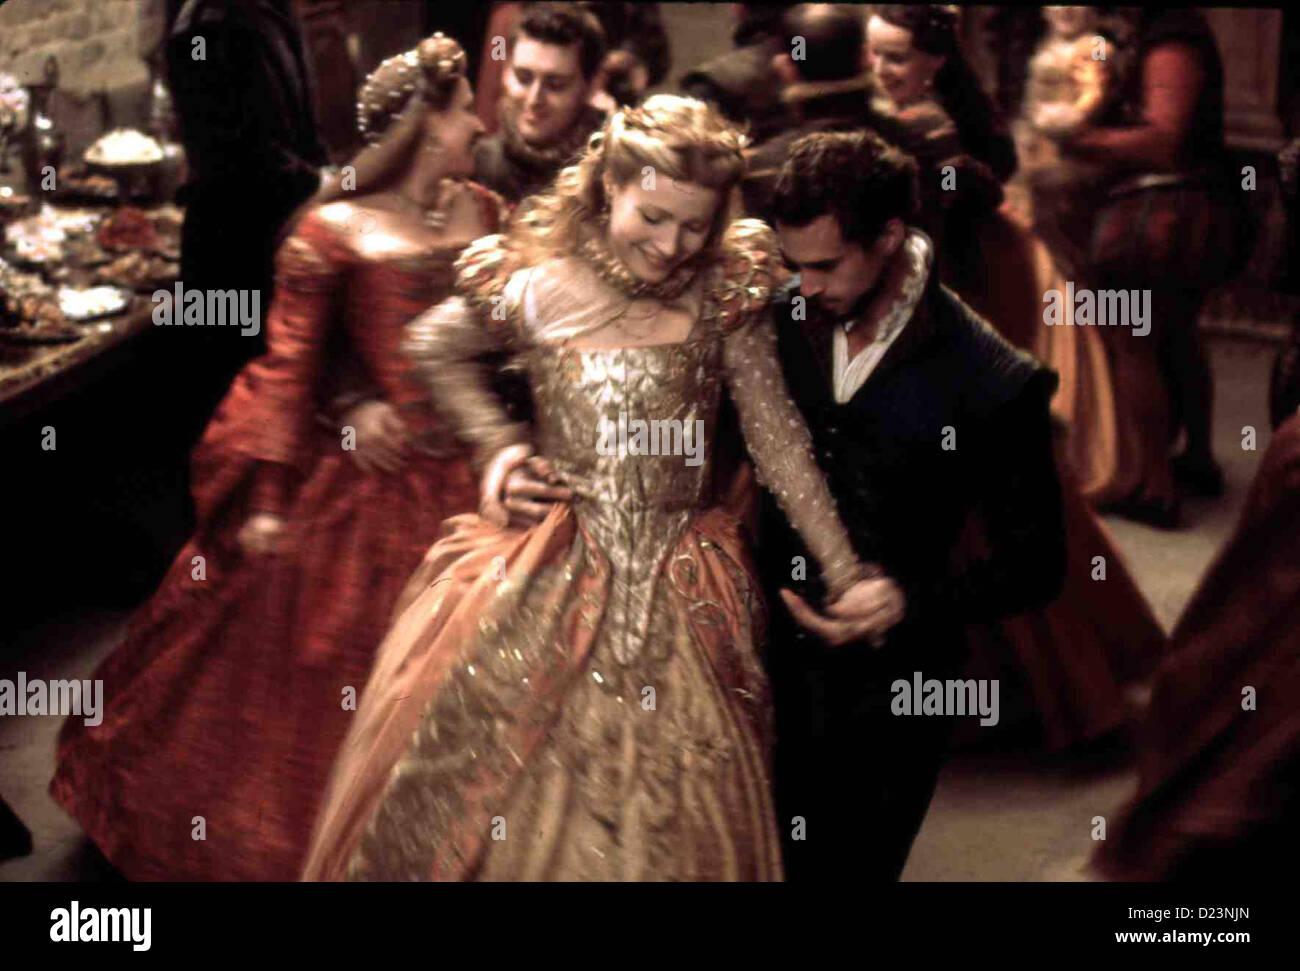 Shakespeare In Love Shakespeare In Love Viola De Lesseps (Gwyneth Paltrow), Shakespeare (Joseph Fiennes) *** Local Immagini Stock